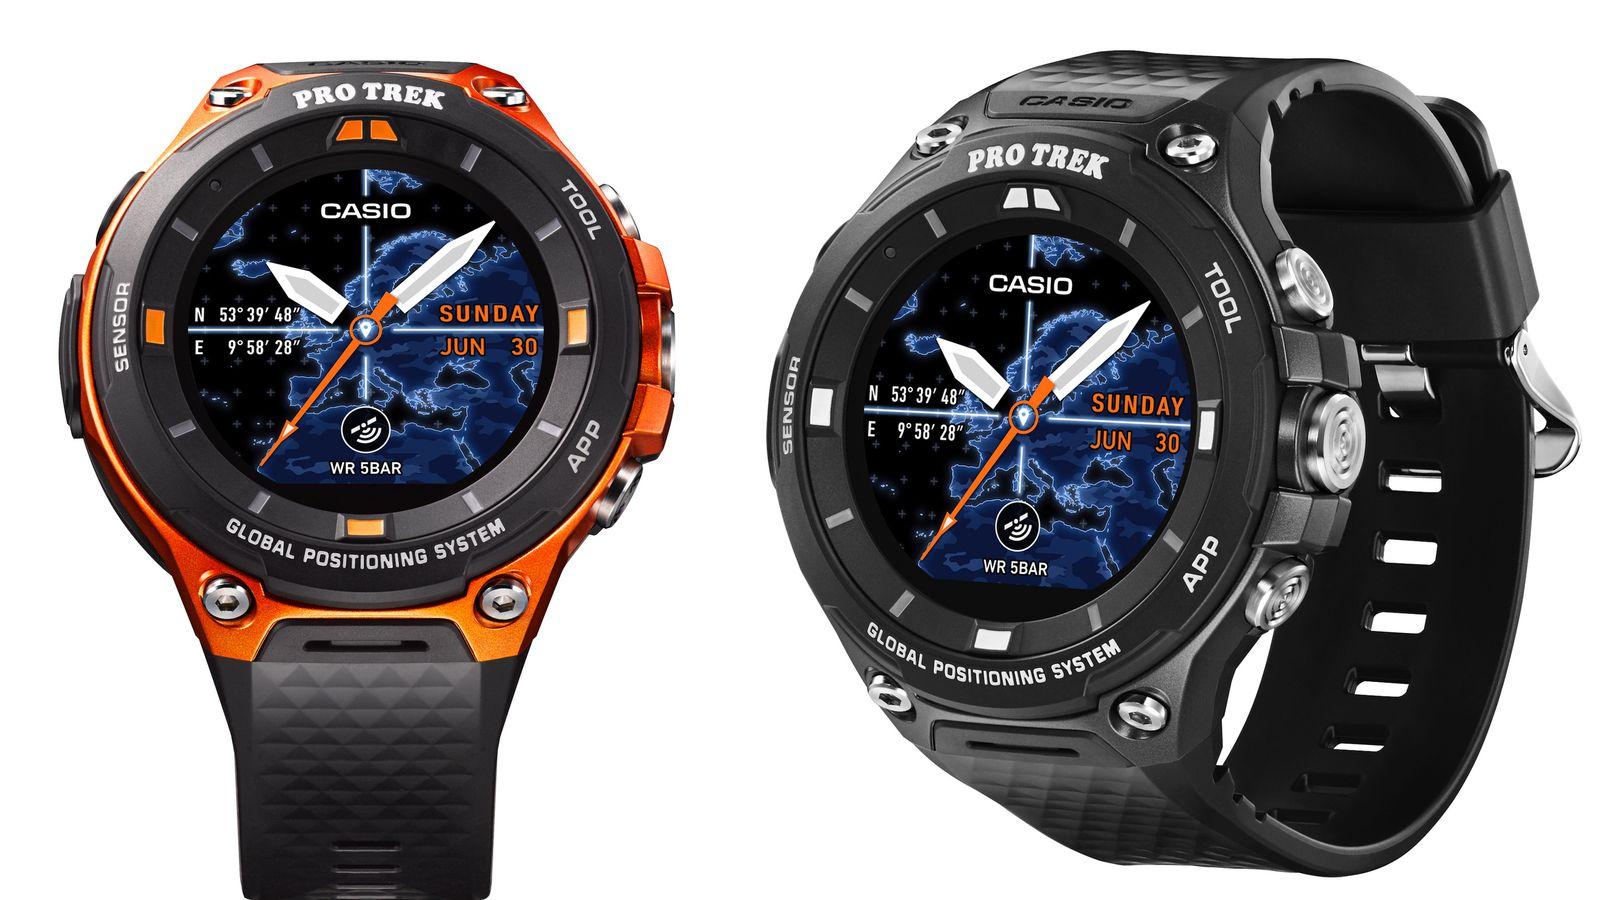 Casios New Outdoor Smartwatch Adds Gps Offline Maps And